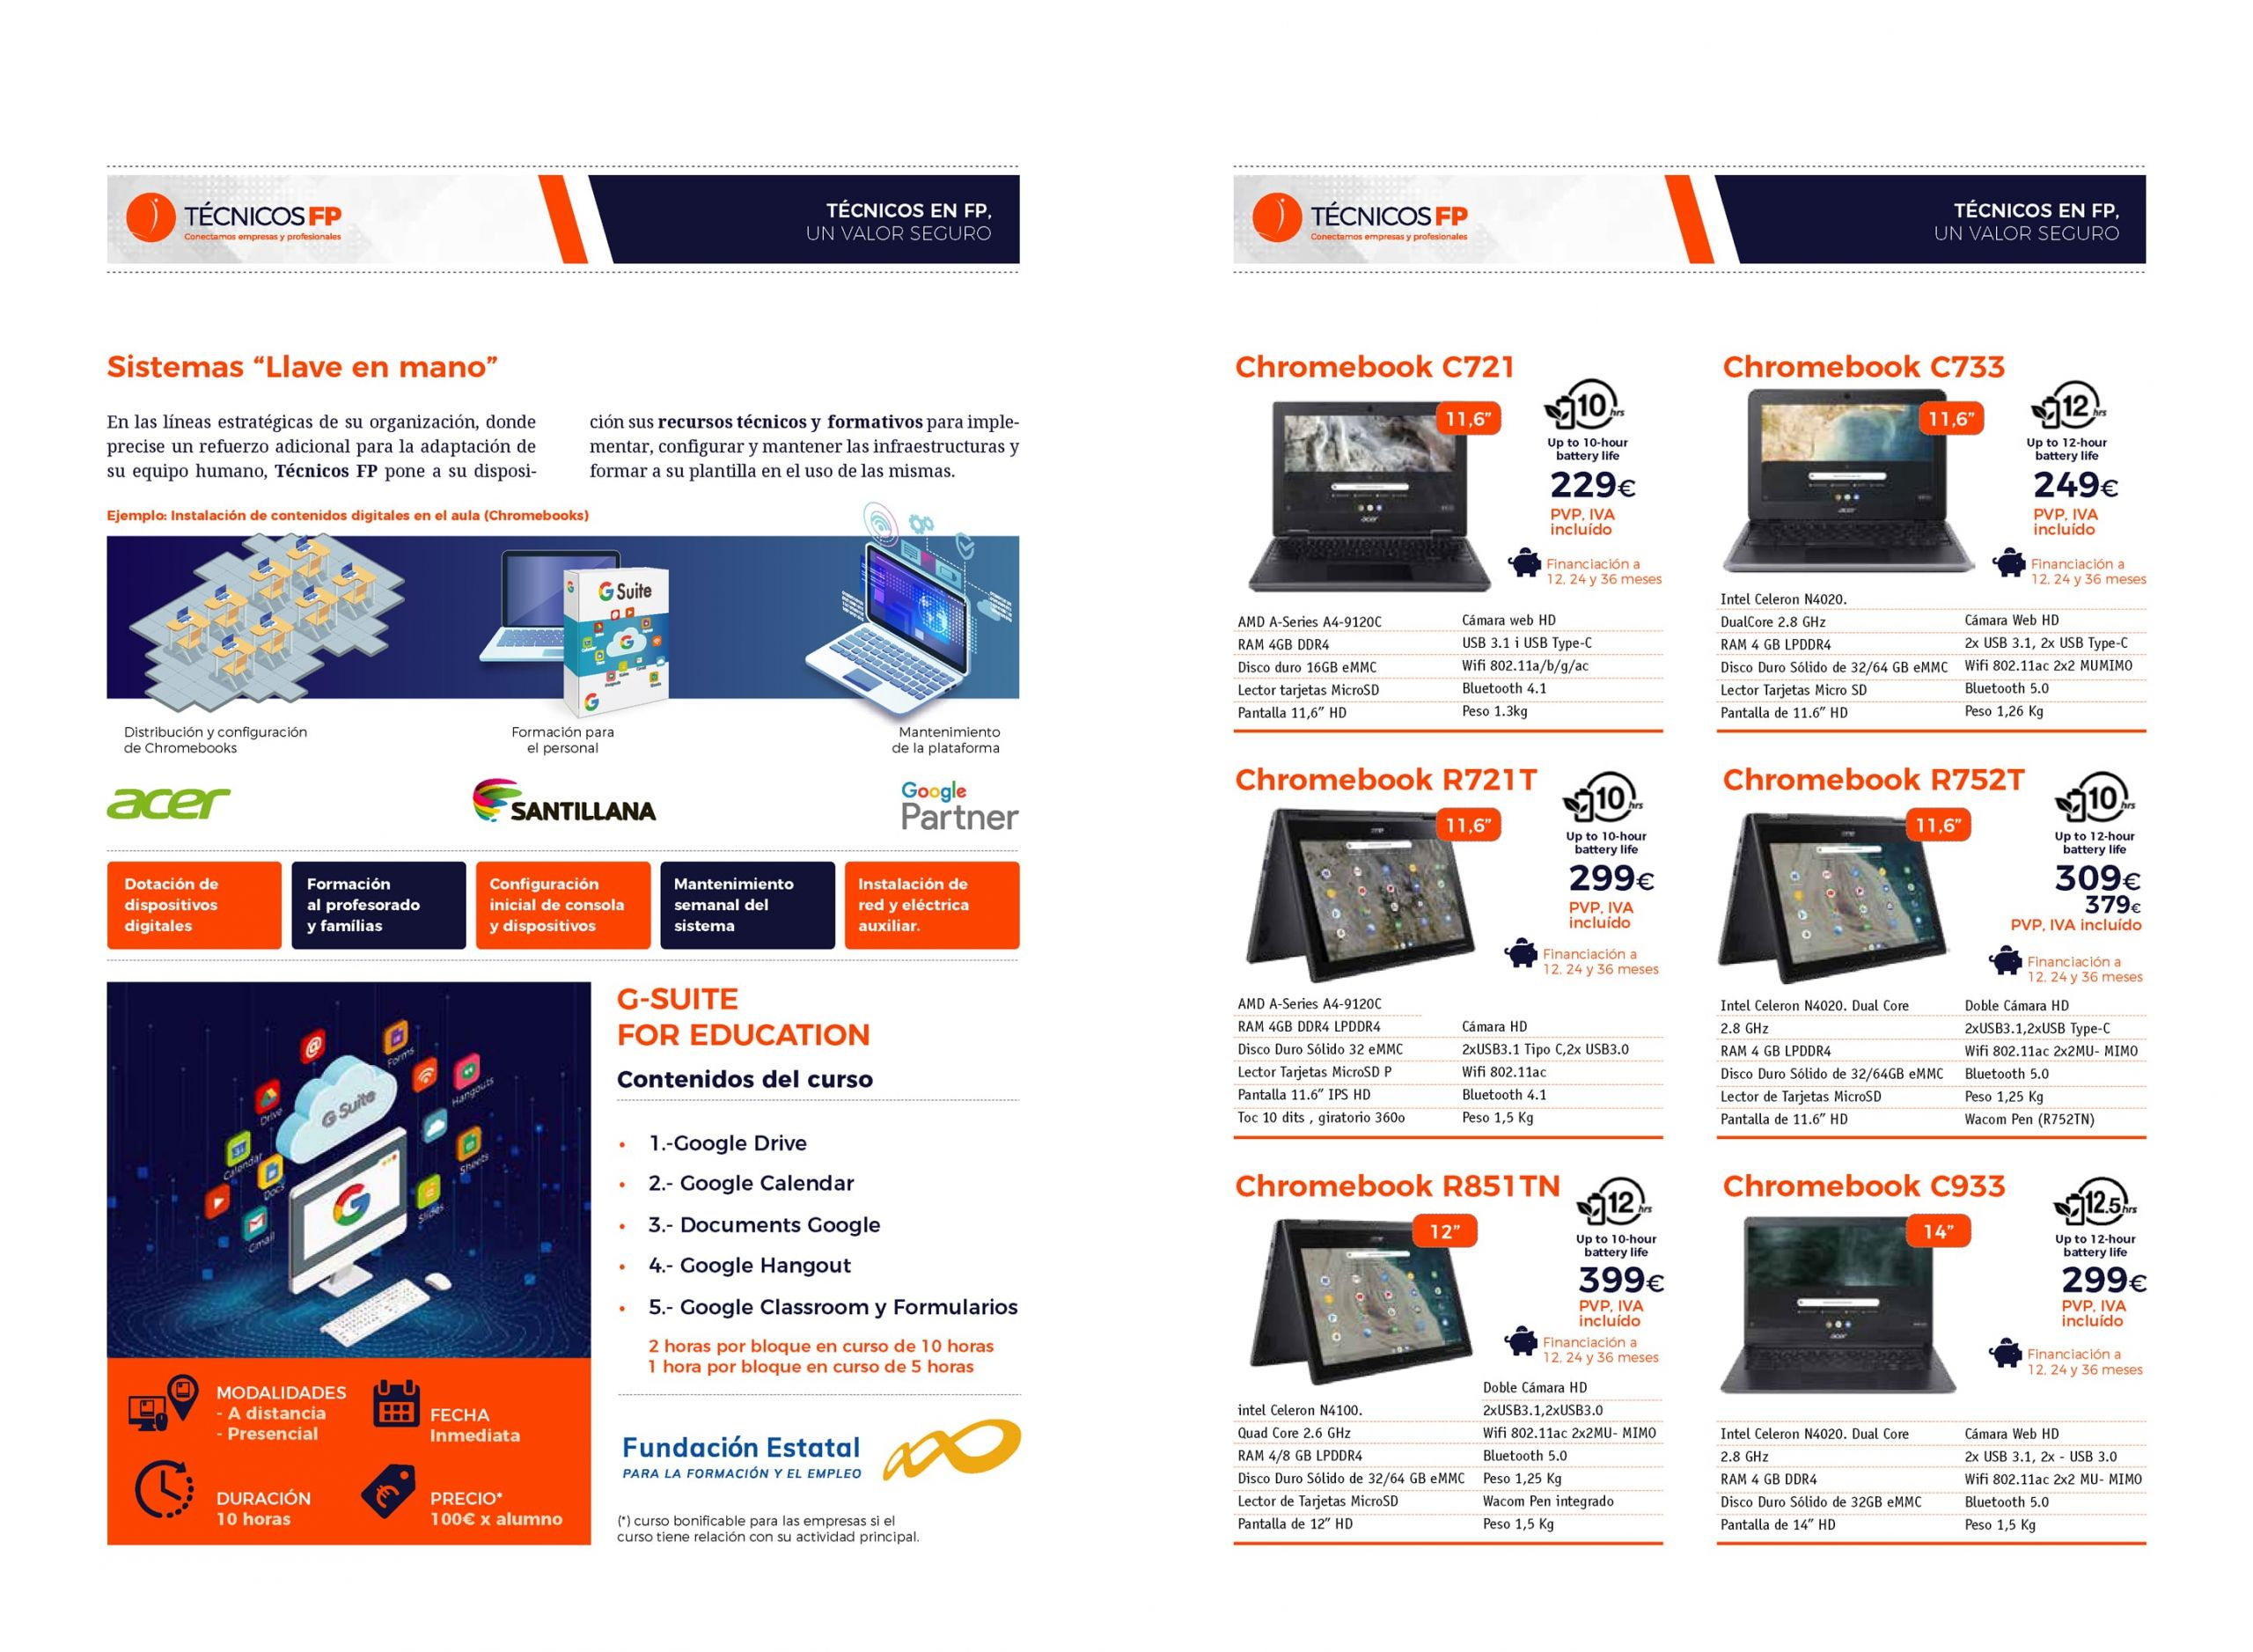 Técnicos FP Versión Interior de folleto